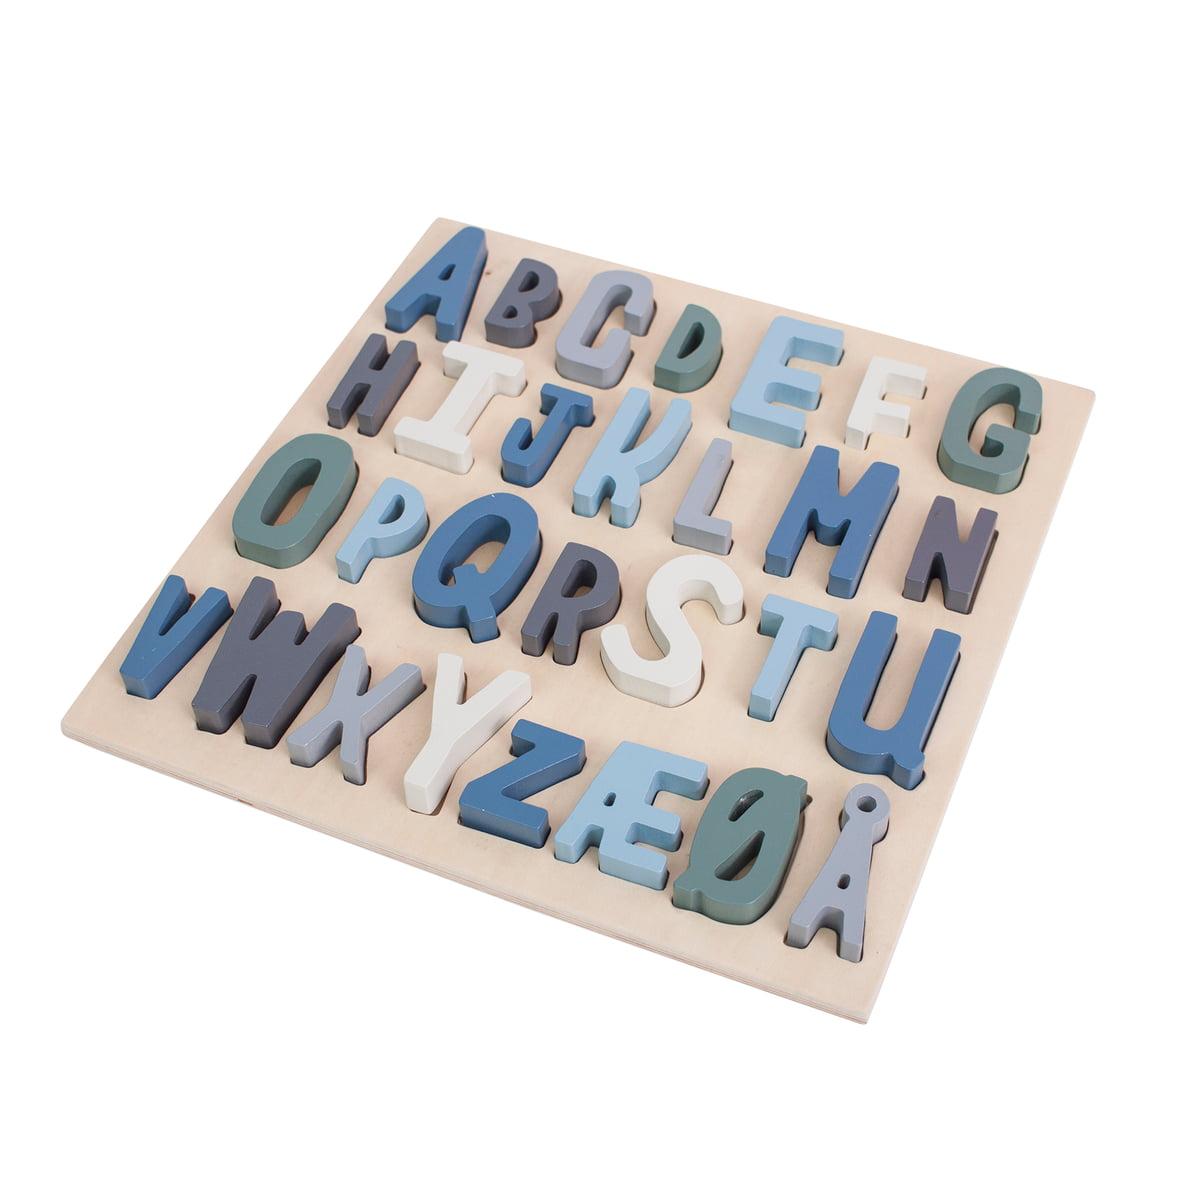 Sebra - Wooden Puzzle ABC (dänisch), royal blue | Kinderzimmer > Spielzeuge > Sonstige Spielzeuge | Sebra